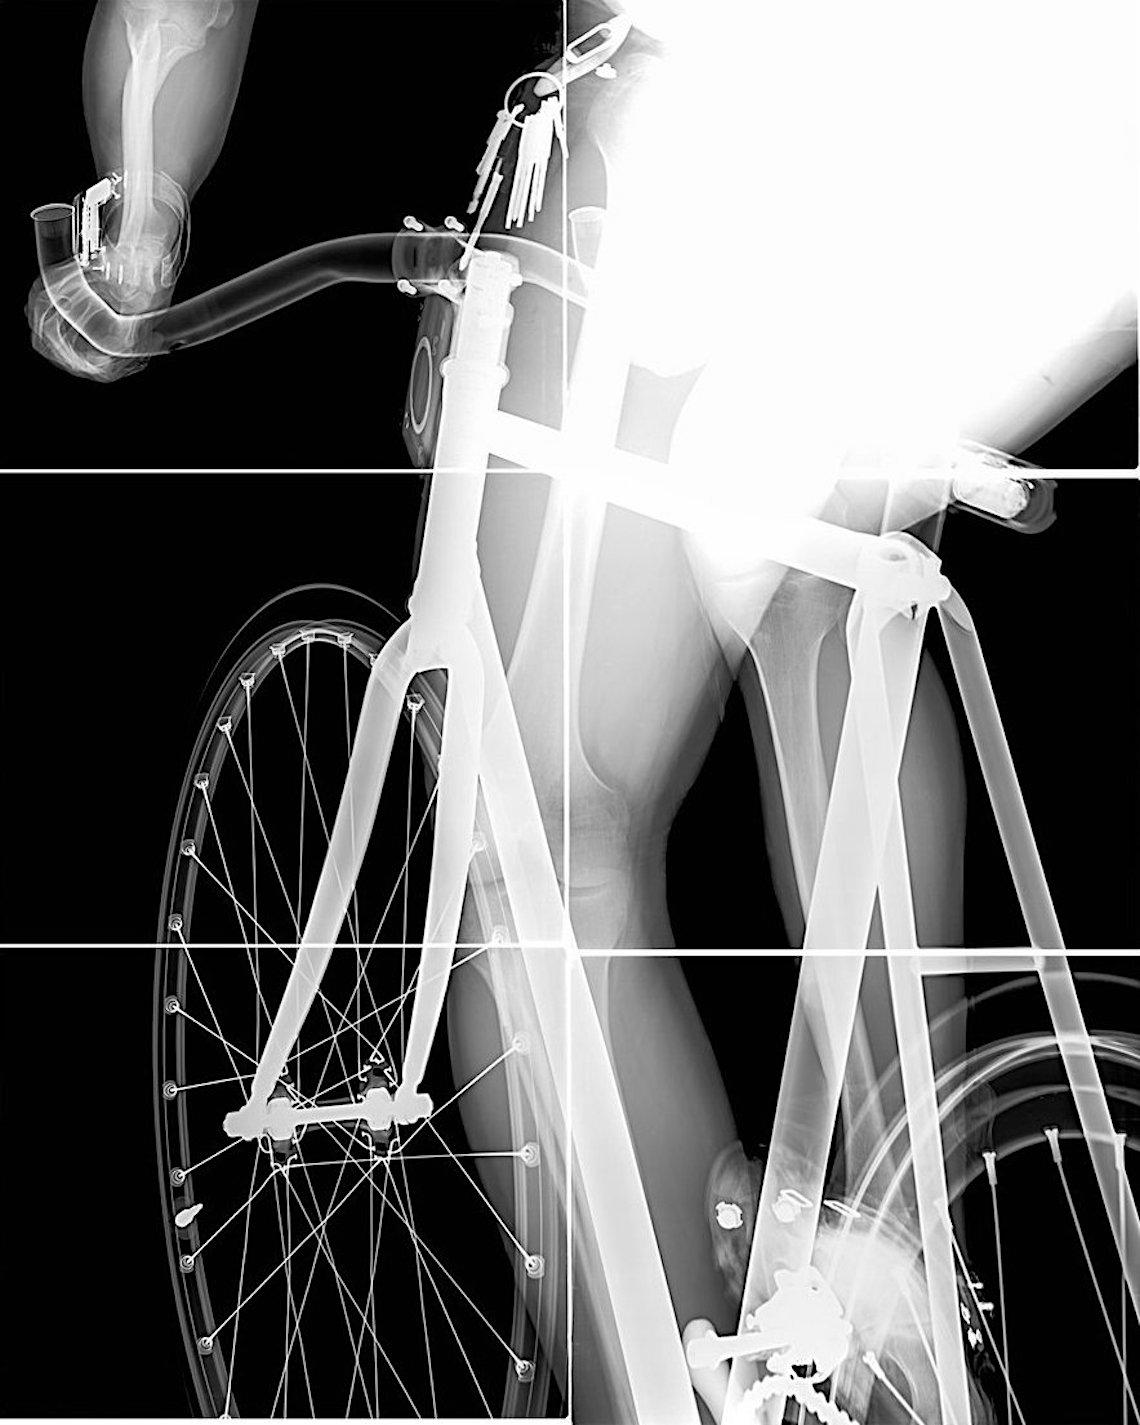 Paul Perret Cycling_x-ray_art_prints_3